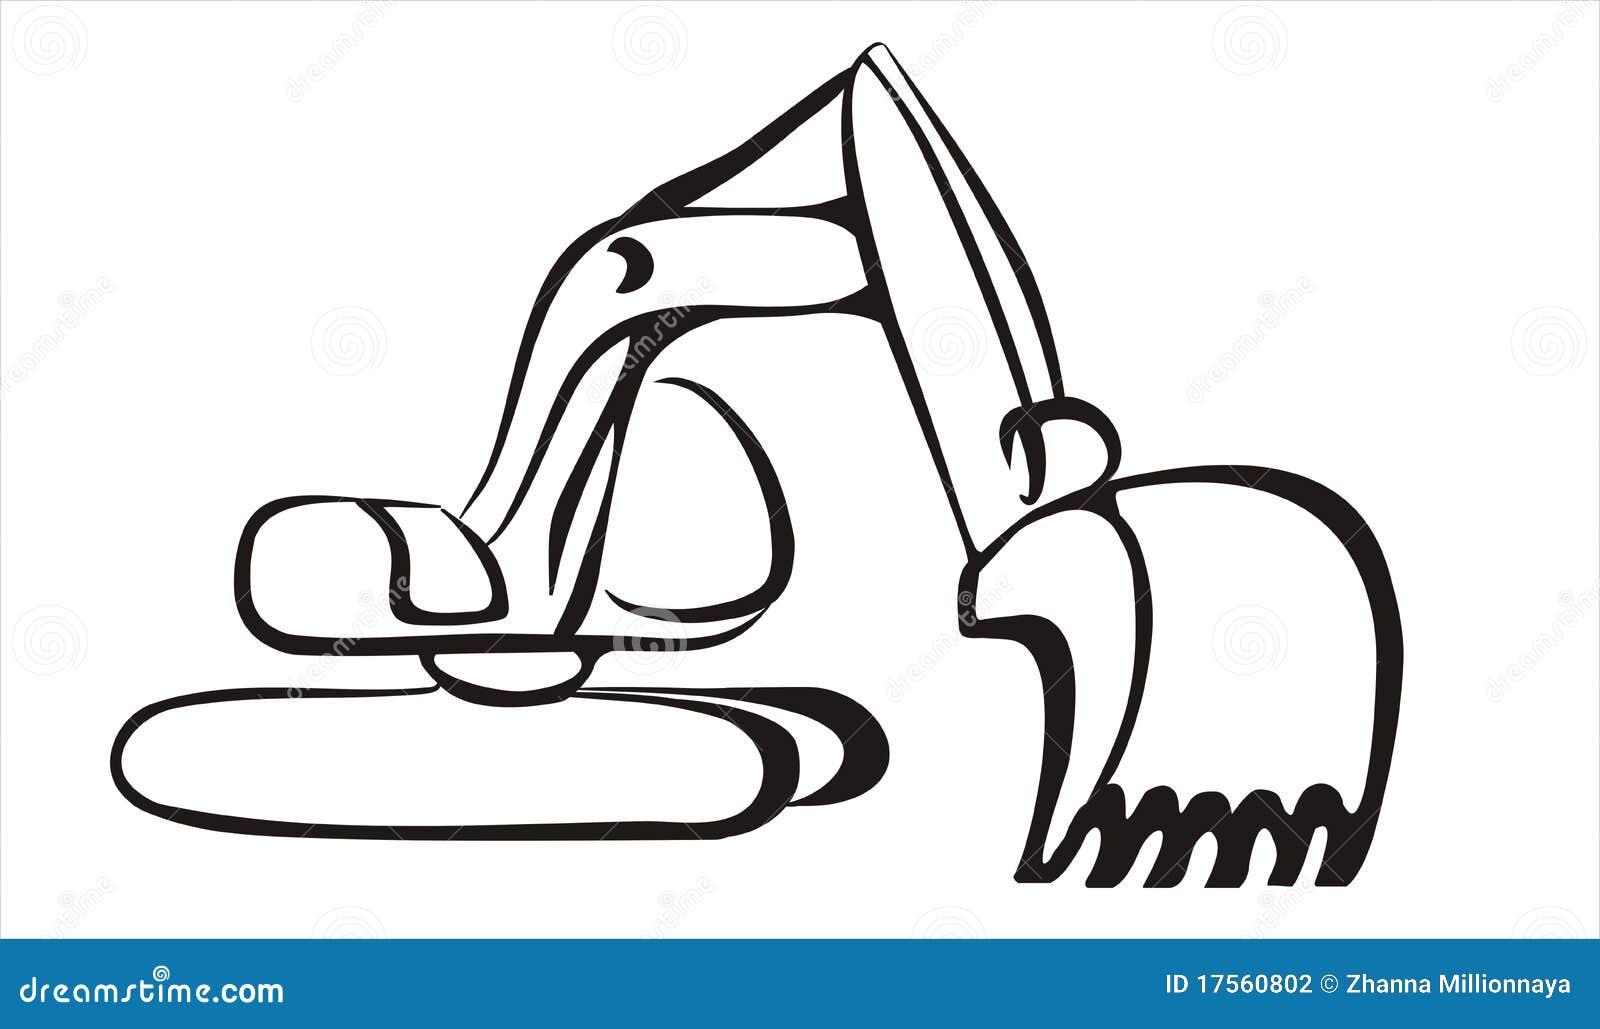 Excavator Icon In Simple Black Lines Stock Vector Image